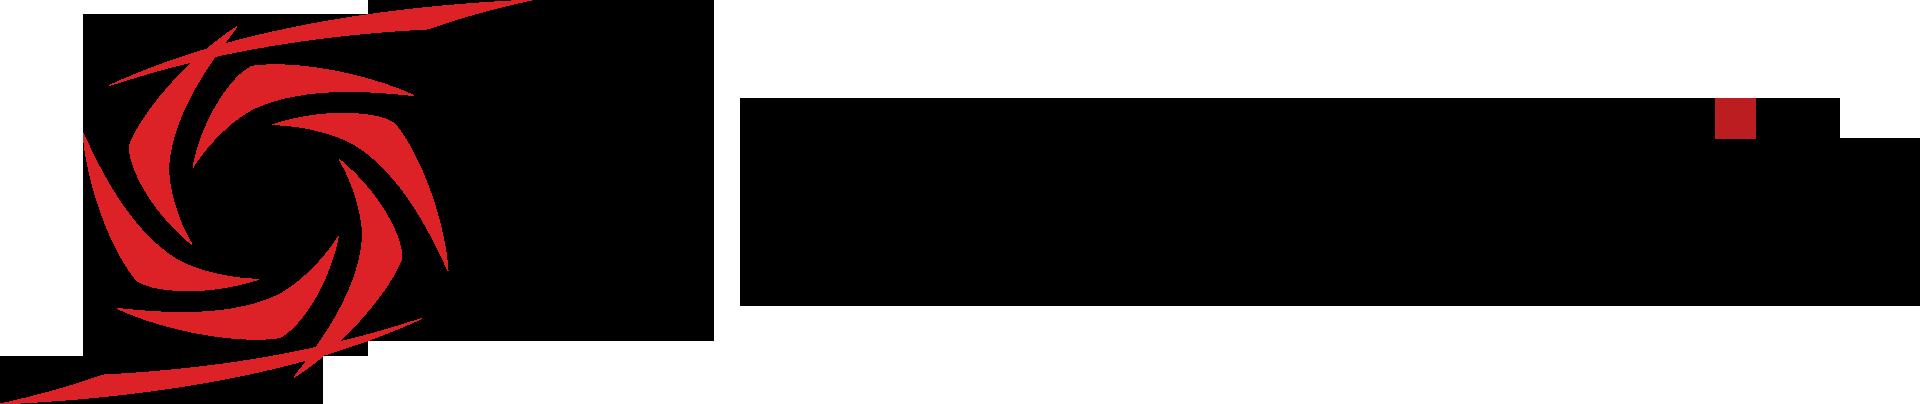 AVerMedia - 인터넷 방송장비